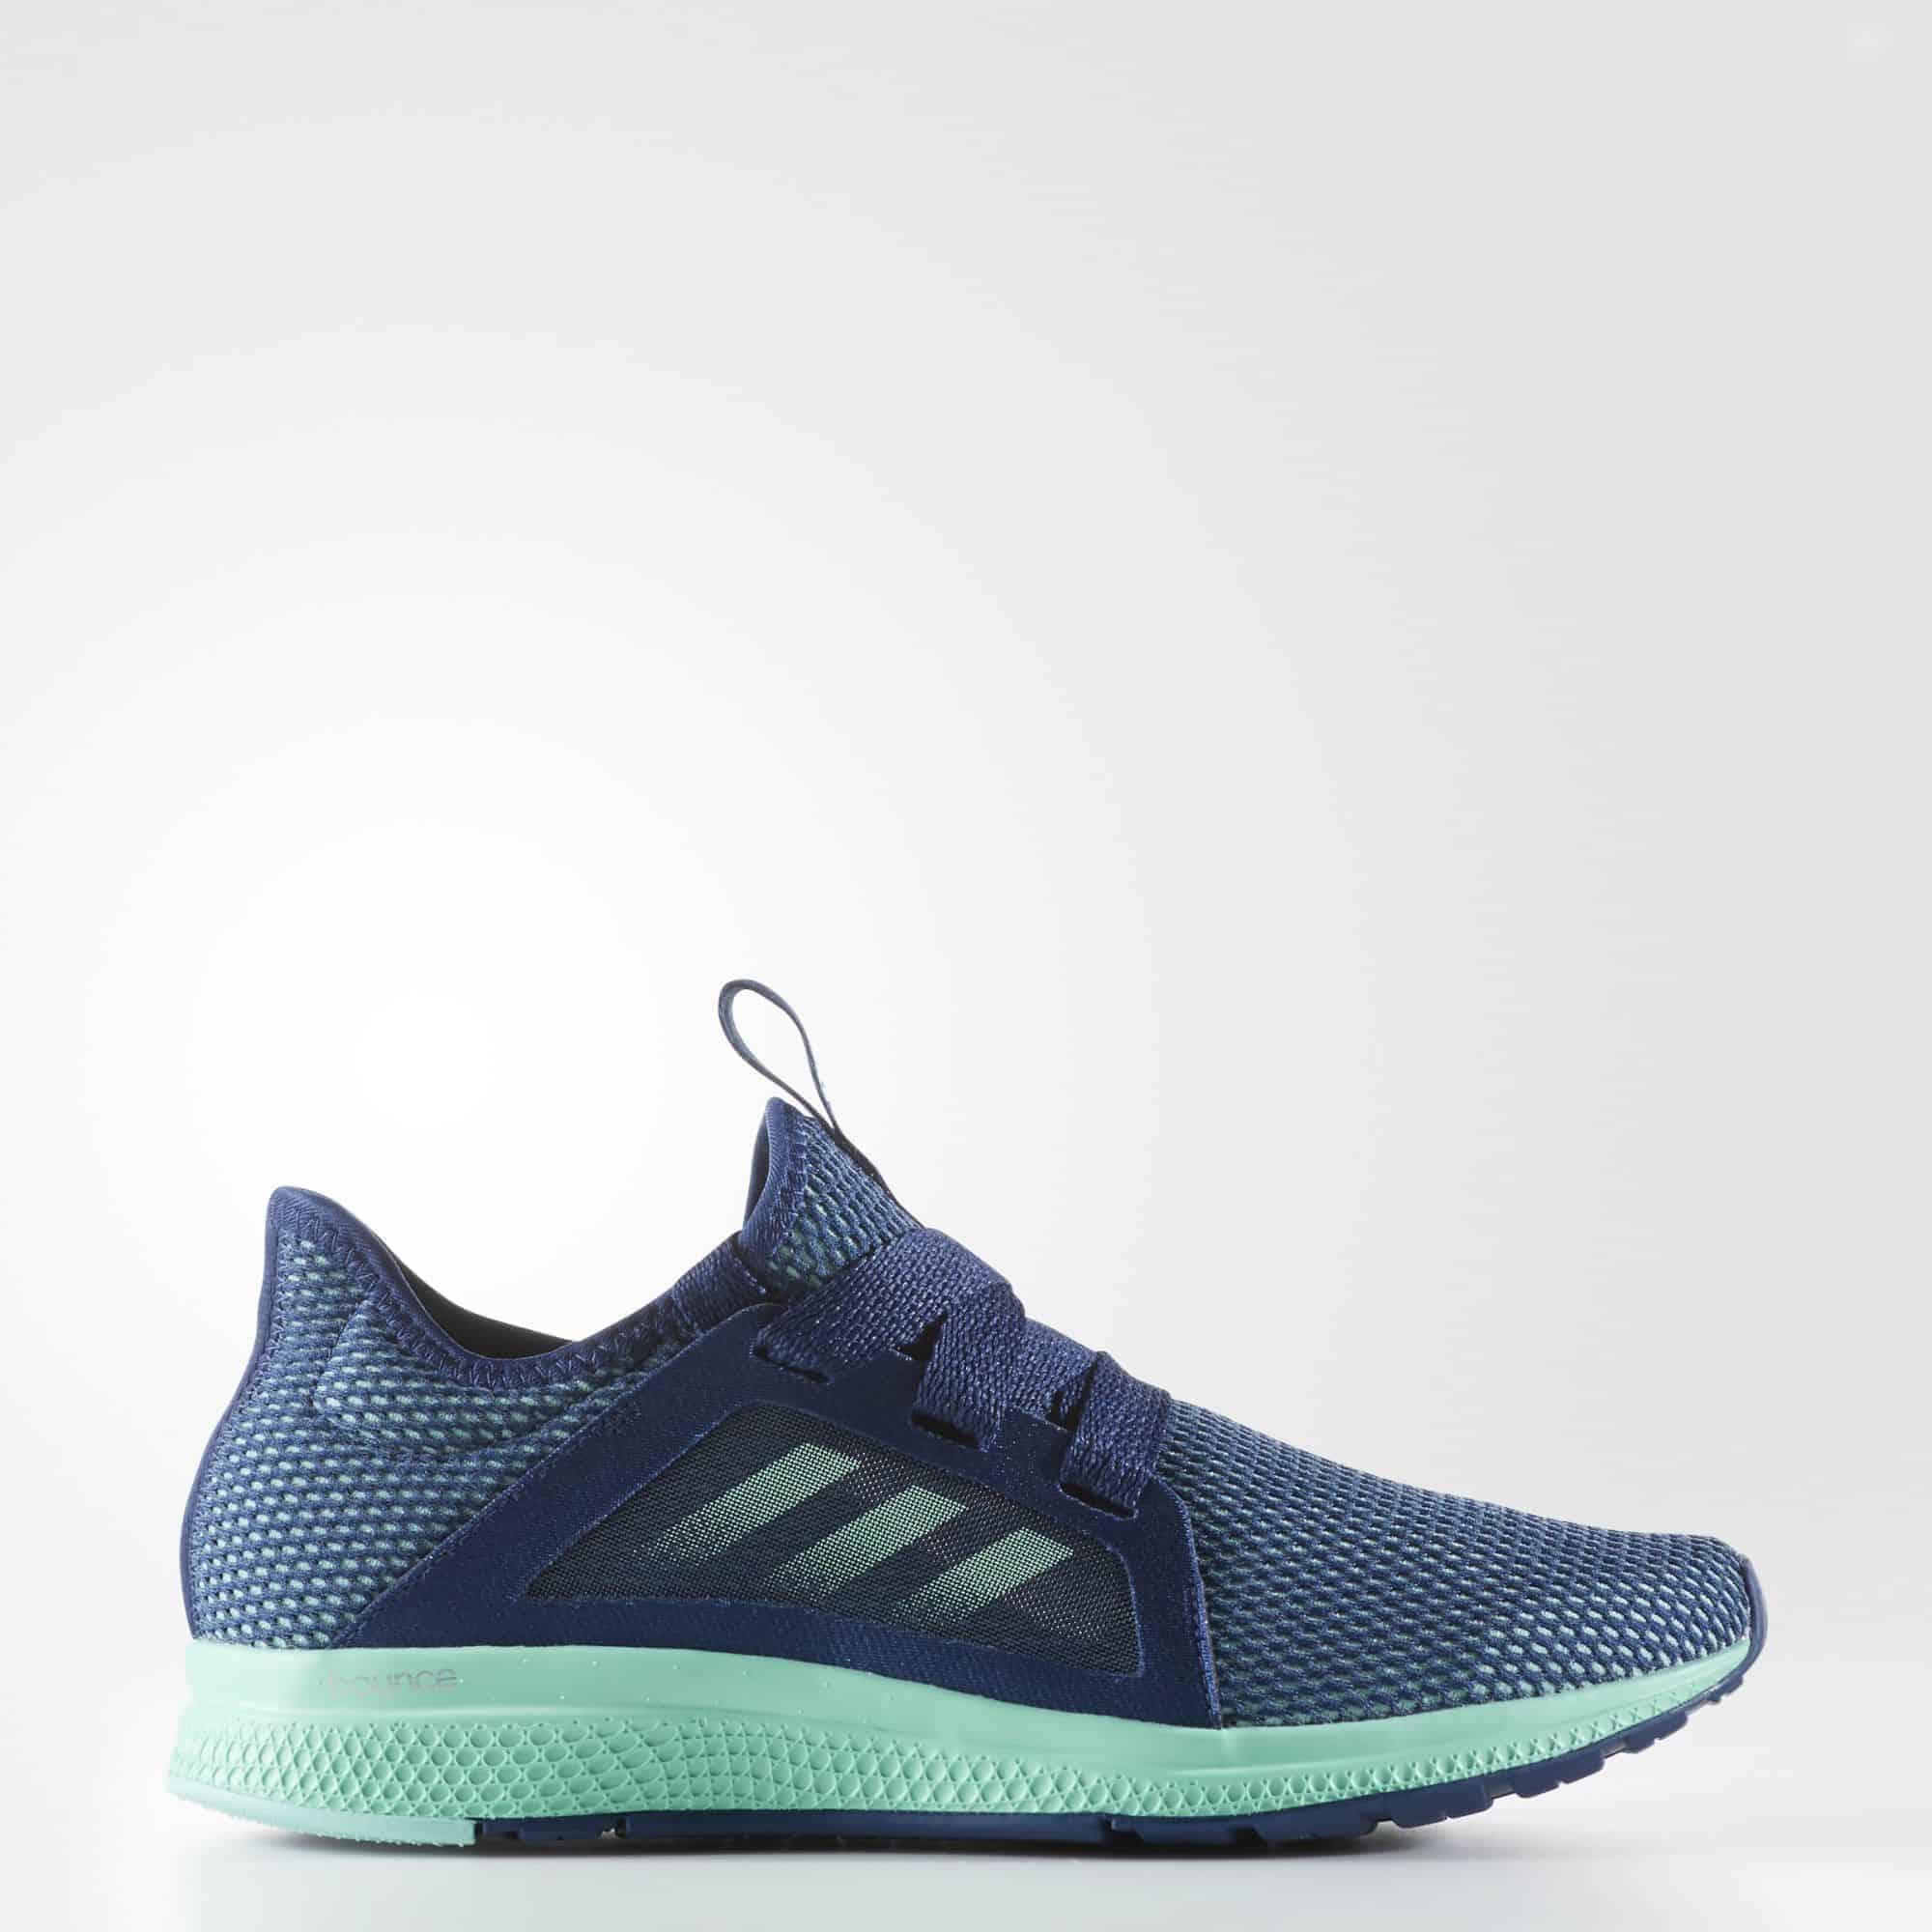 Кроссовки для бега Adidas Edge Luxe женские